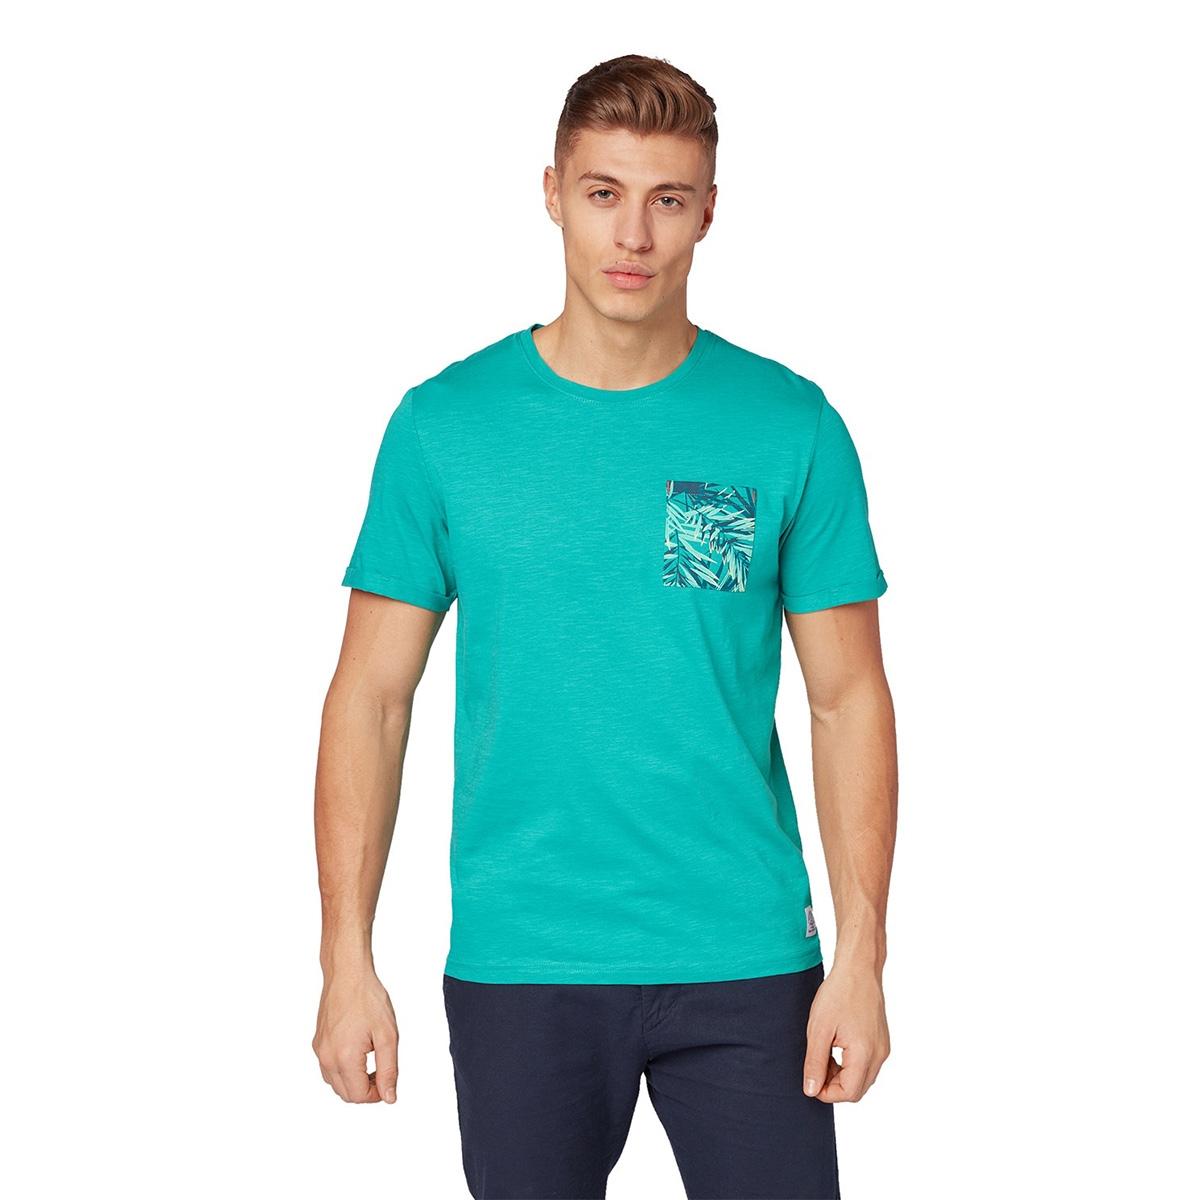 t shirt met borstzak 1011568xx10 tom tailor t-shirt 16205